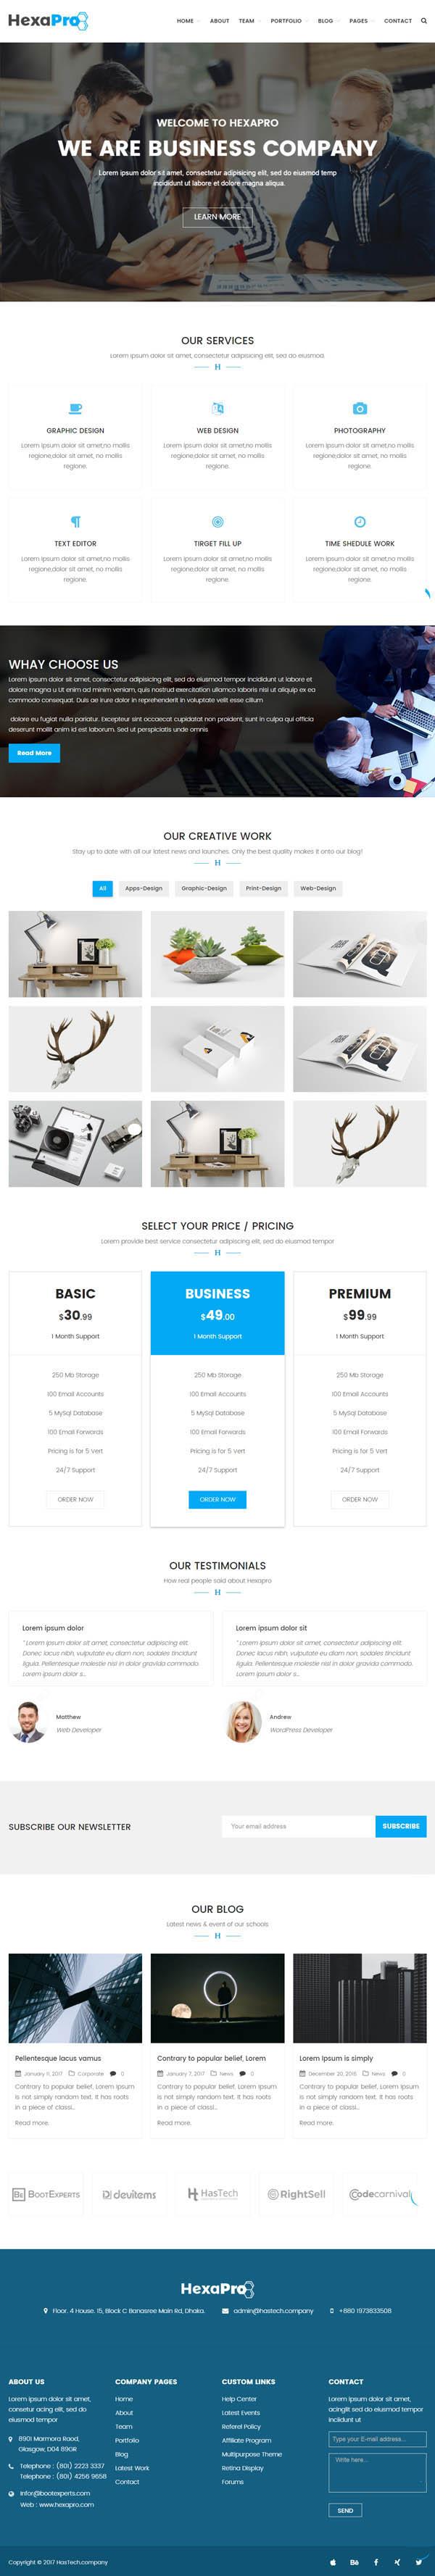 Hexapro : Corporate WordPress Theme